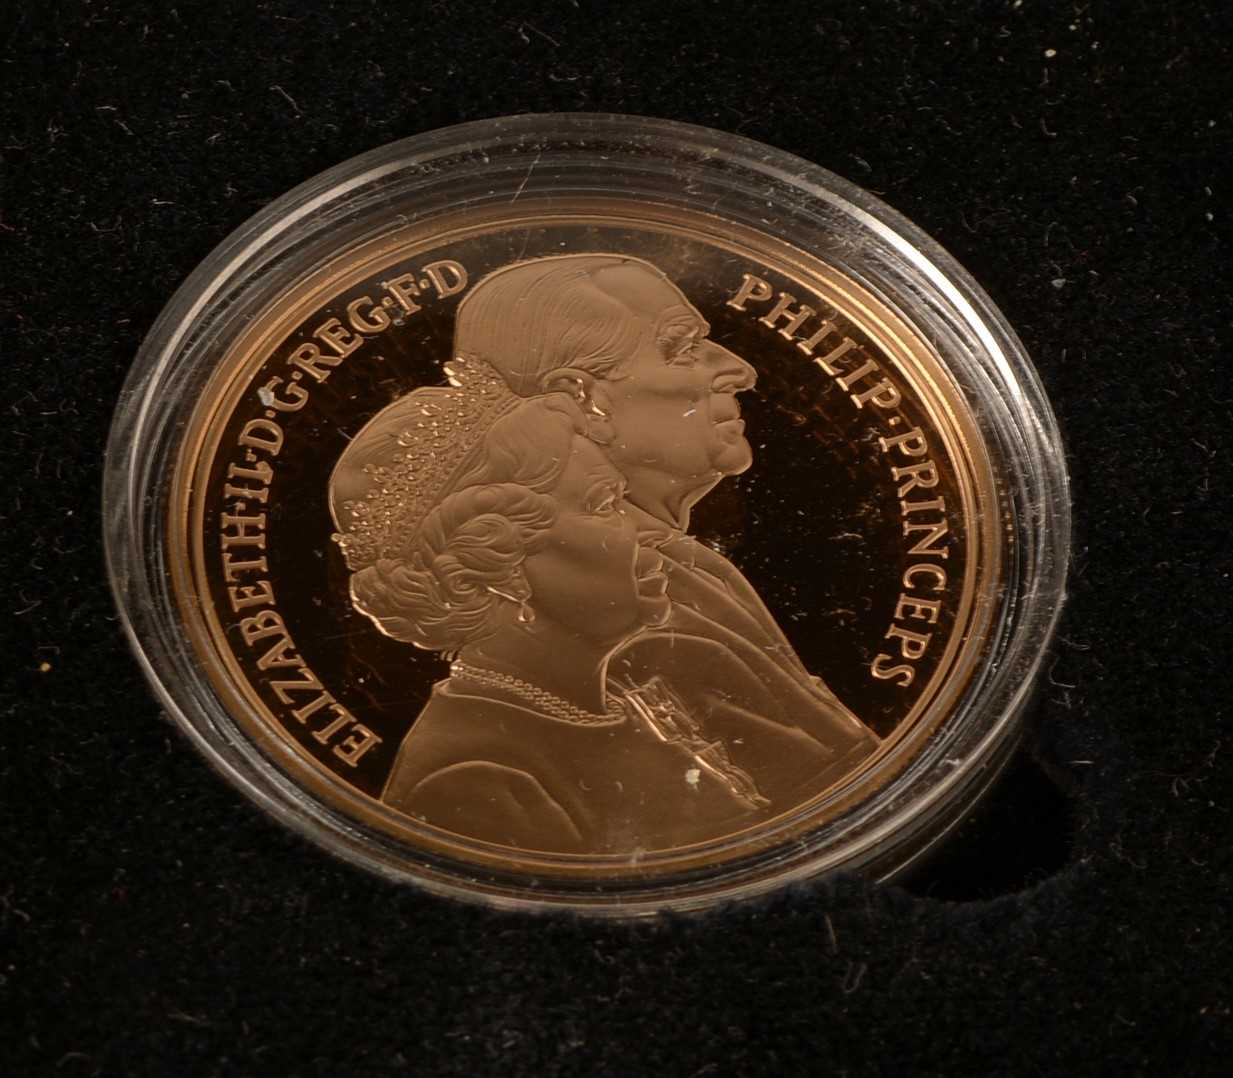 1085 - Golden Wedding gold £5